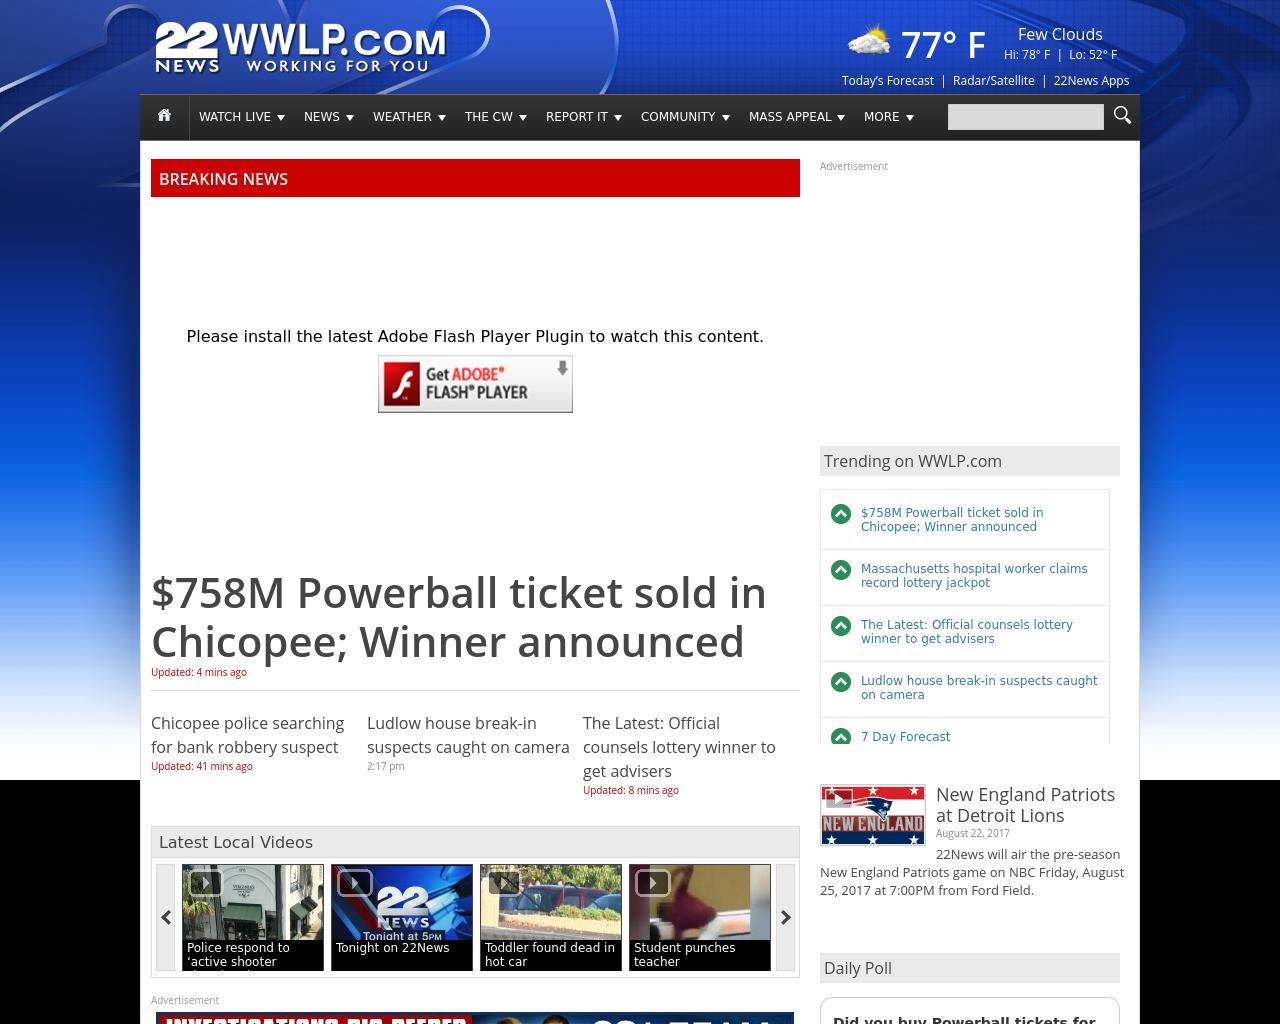 22News---WWLP.com-Advertising-Reviews-Pricing